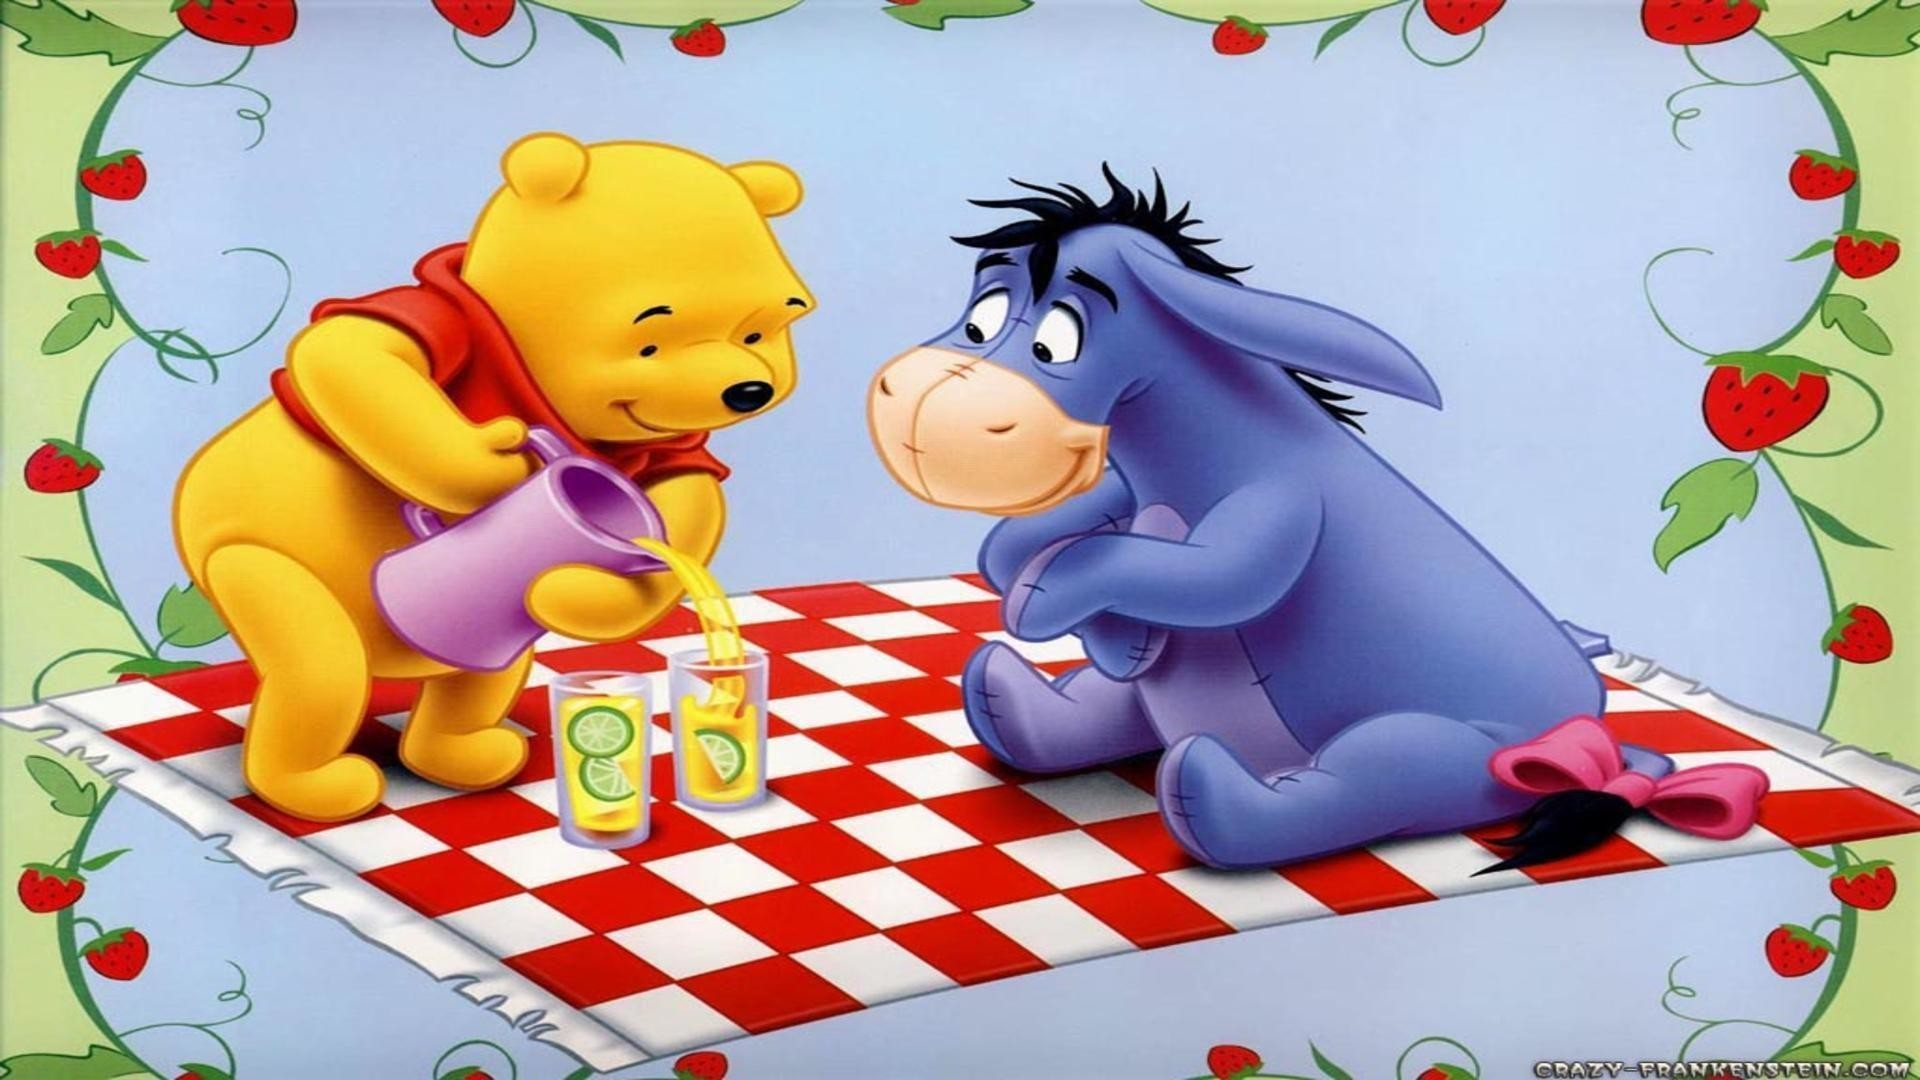 Winnie and eeyore picnic wallpaper cartoon frame free desktop .